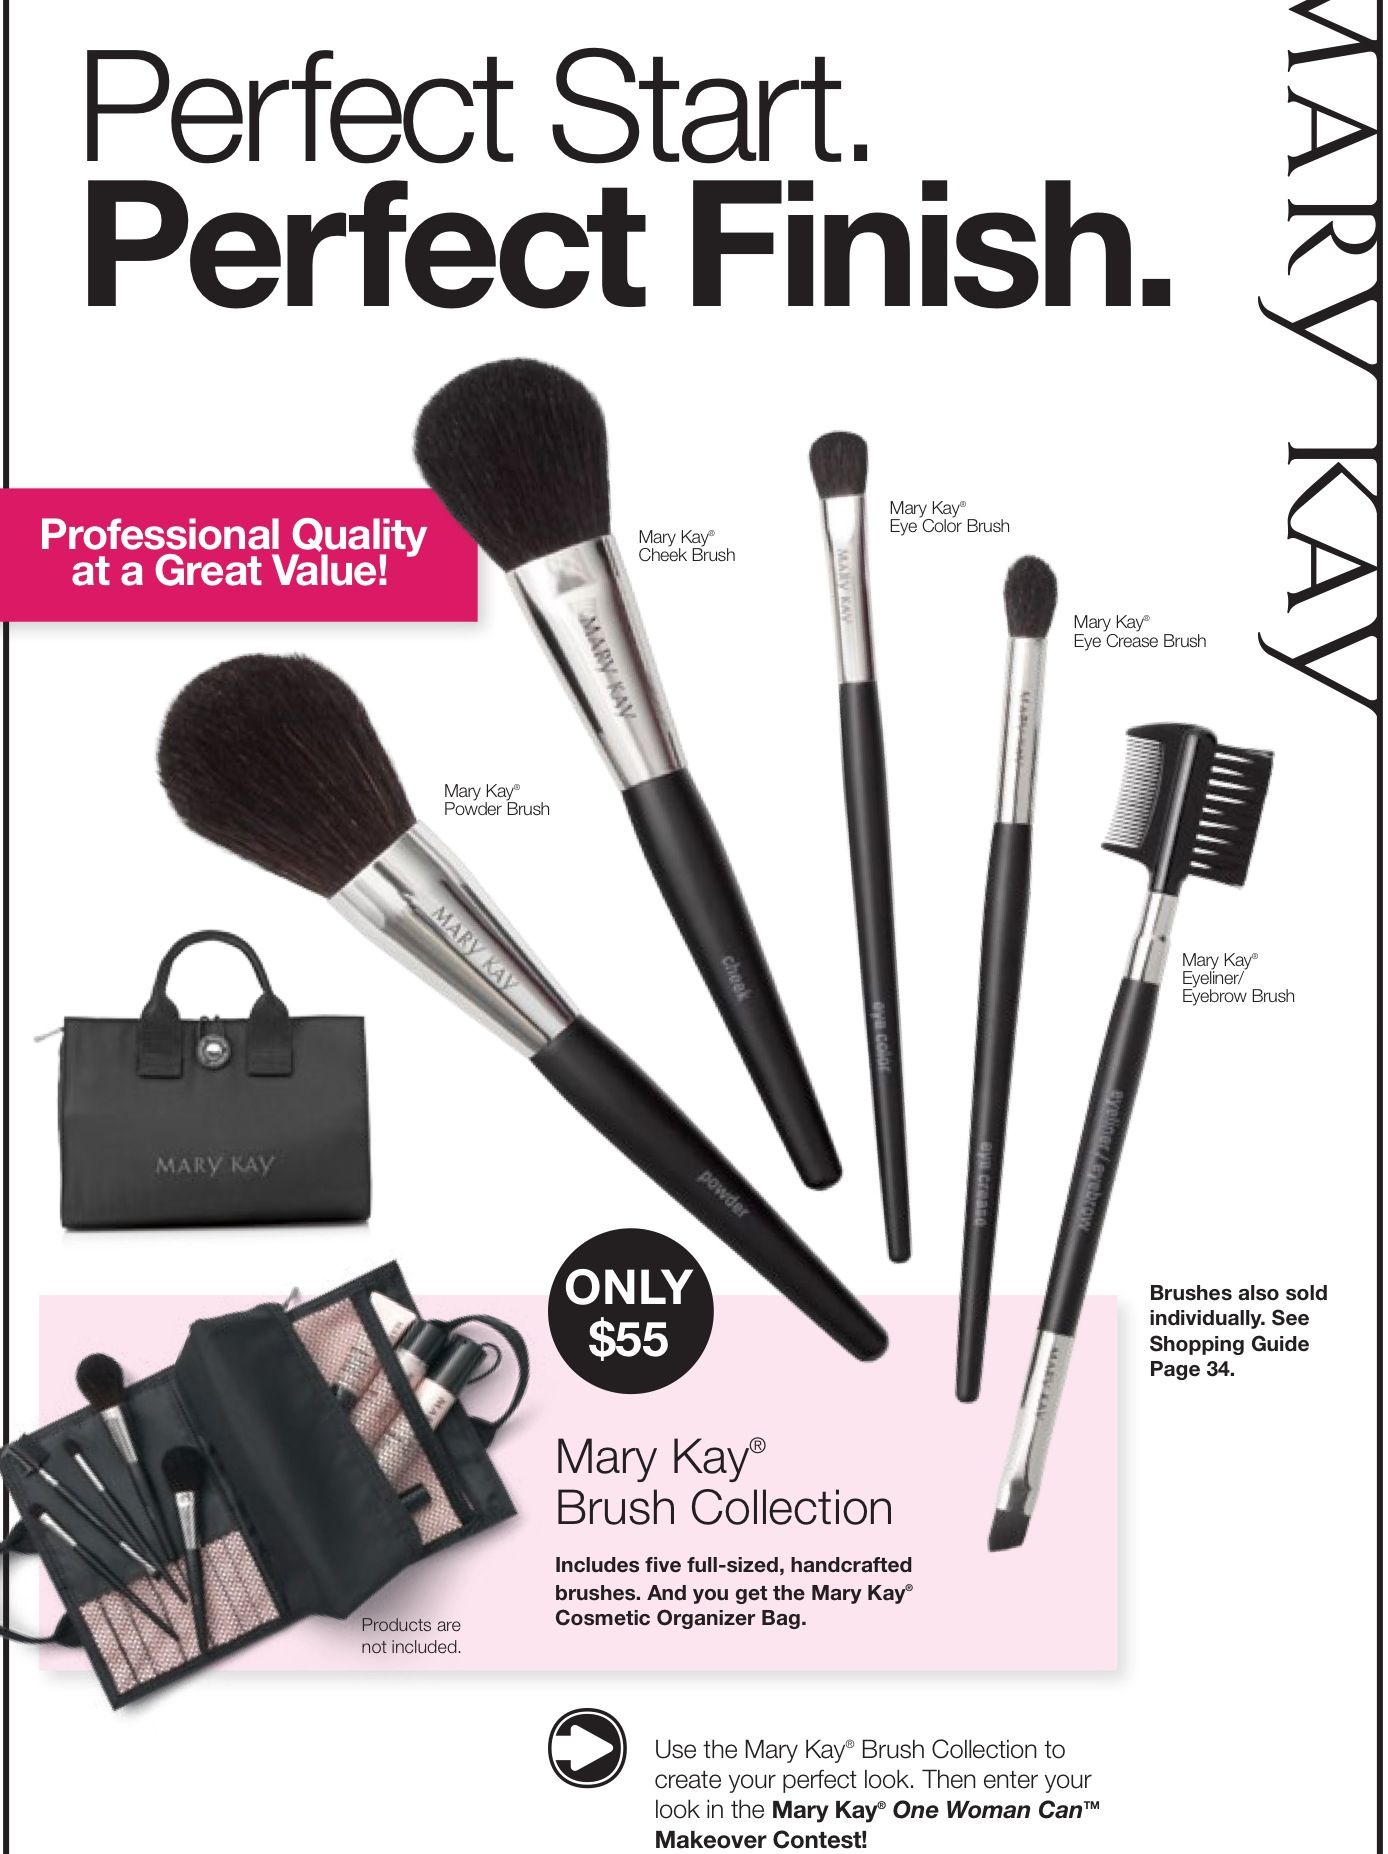 Wonderful Brush Set. I'm a Mary Kay Beauty Consultant